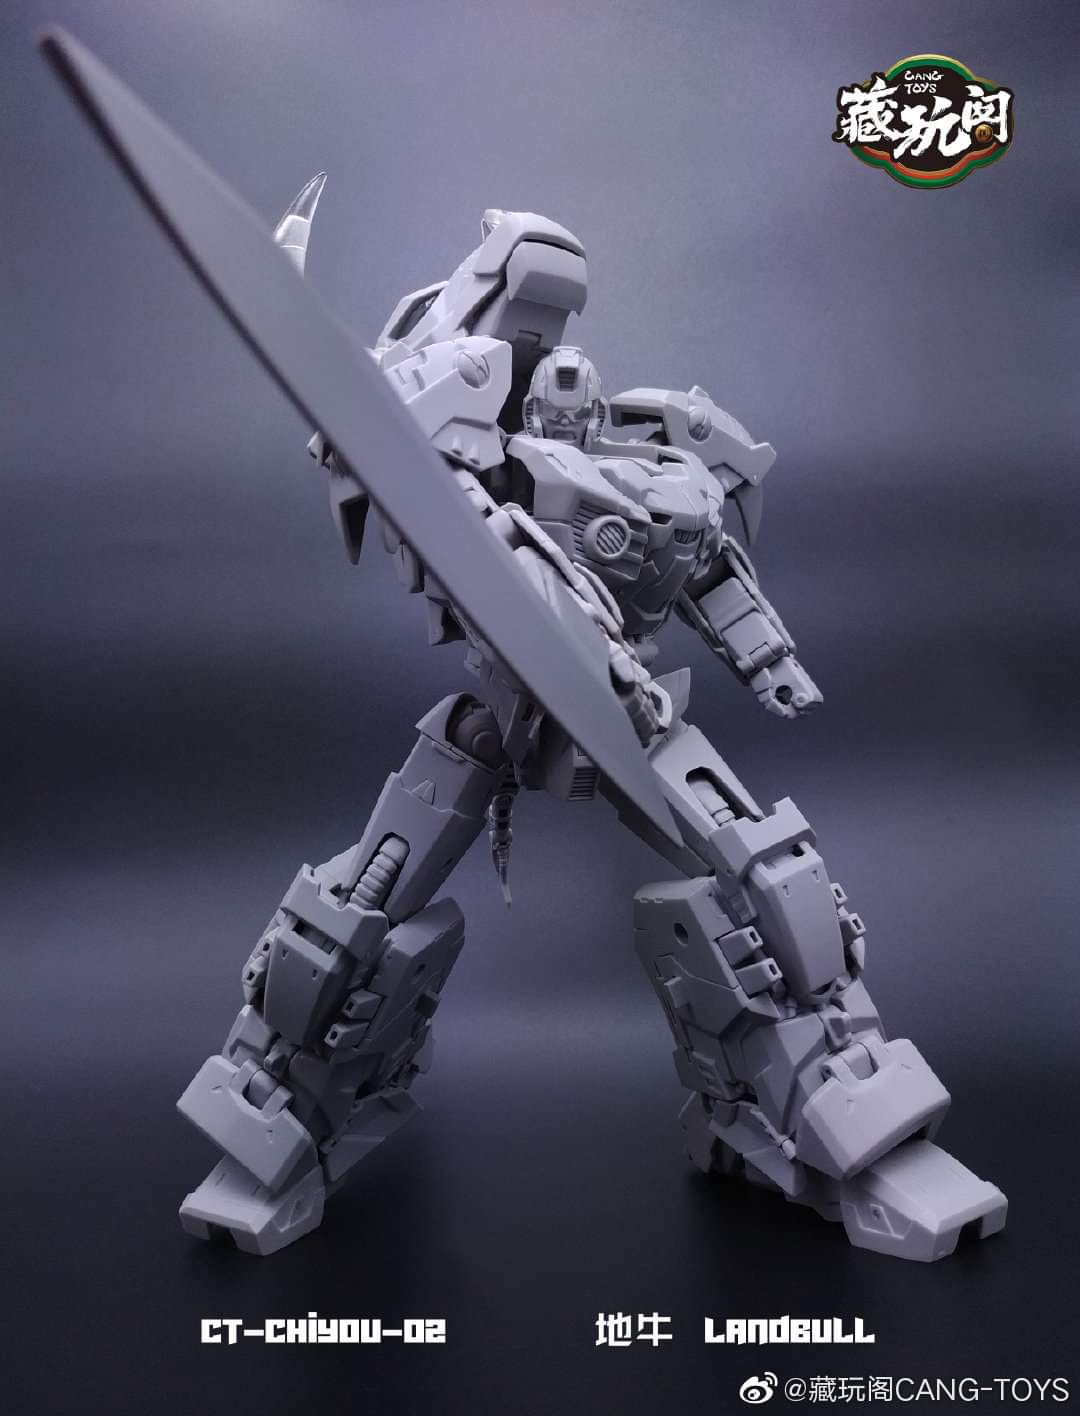 [Toyworld][Cang-Toys] Produit Tiers - Thunderking/Chiyou - aka Predaking/Prédaroi (Prédacons) AiK15feR_o